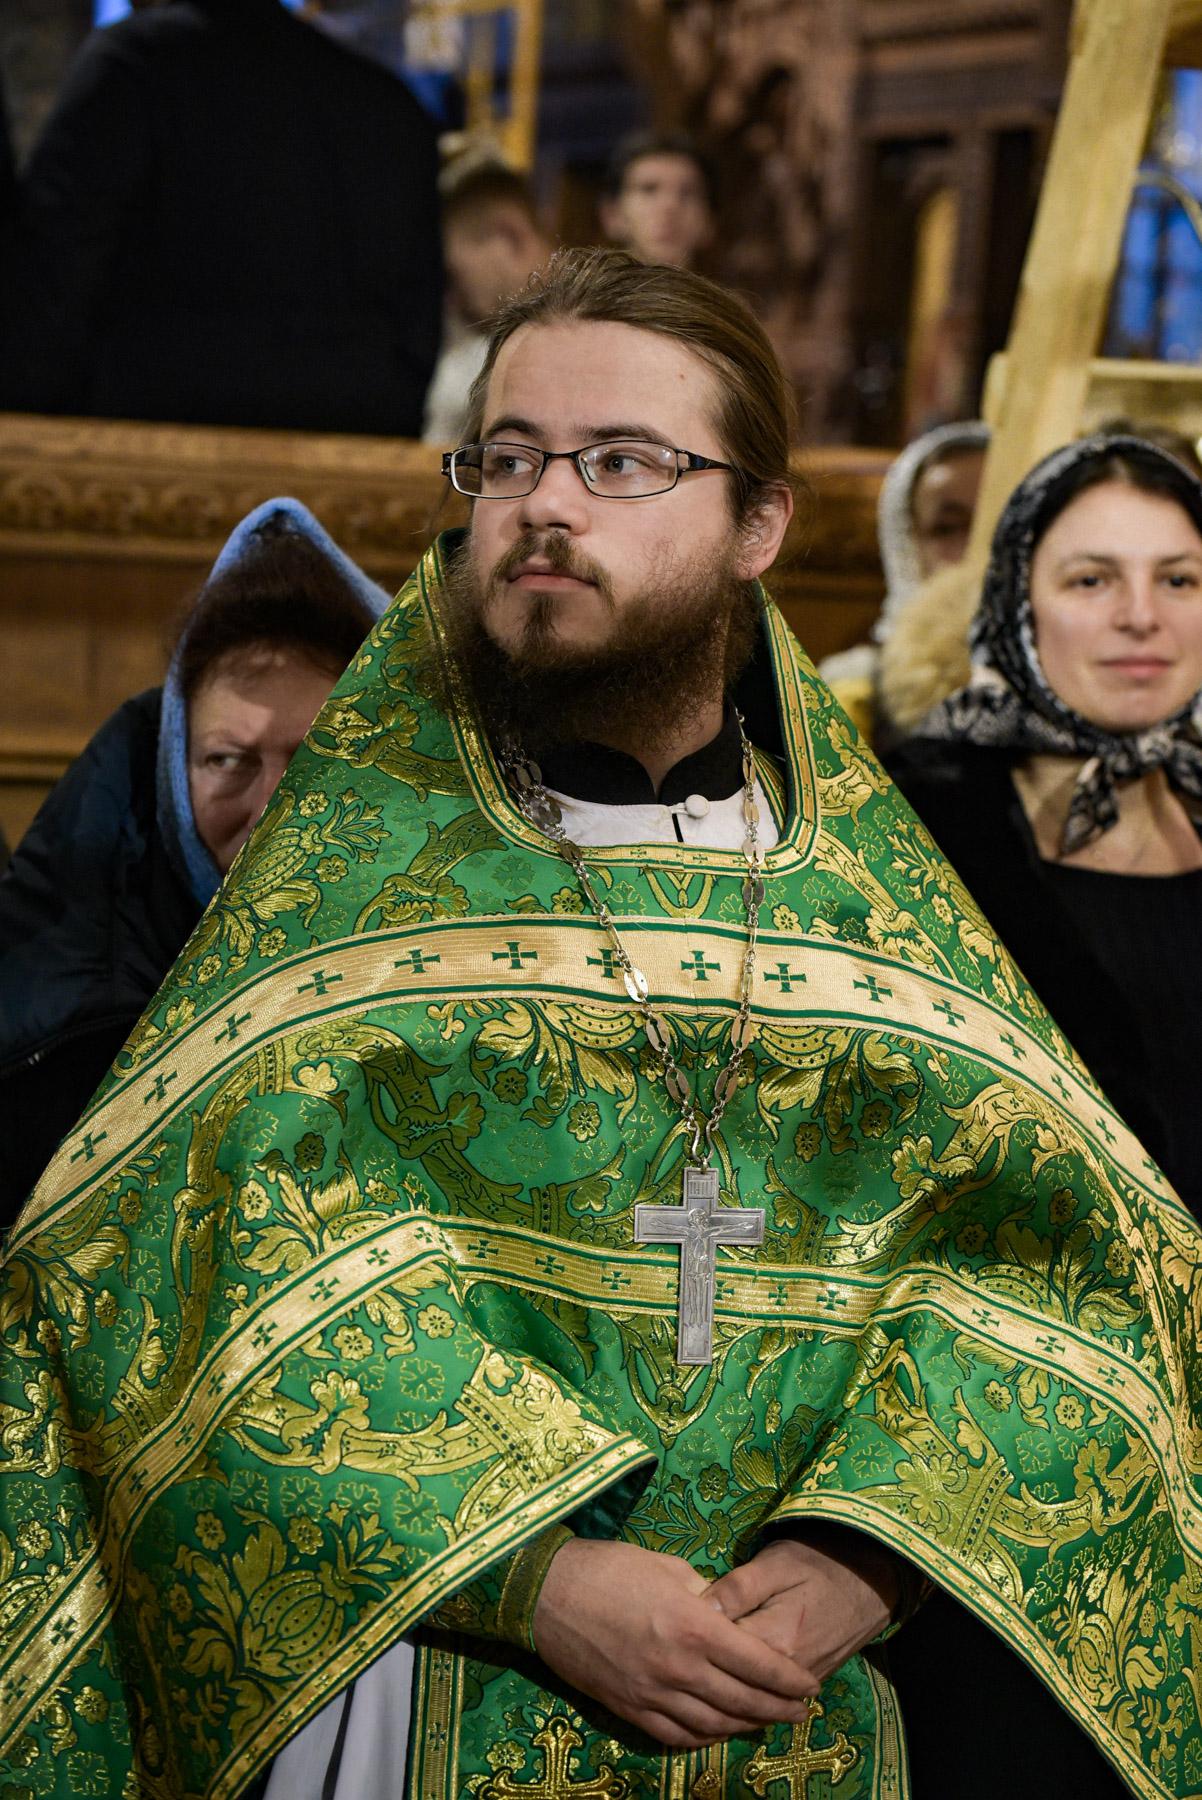 photos of orthodox christmas 0088 2